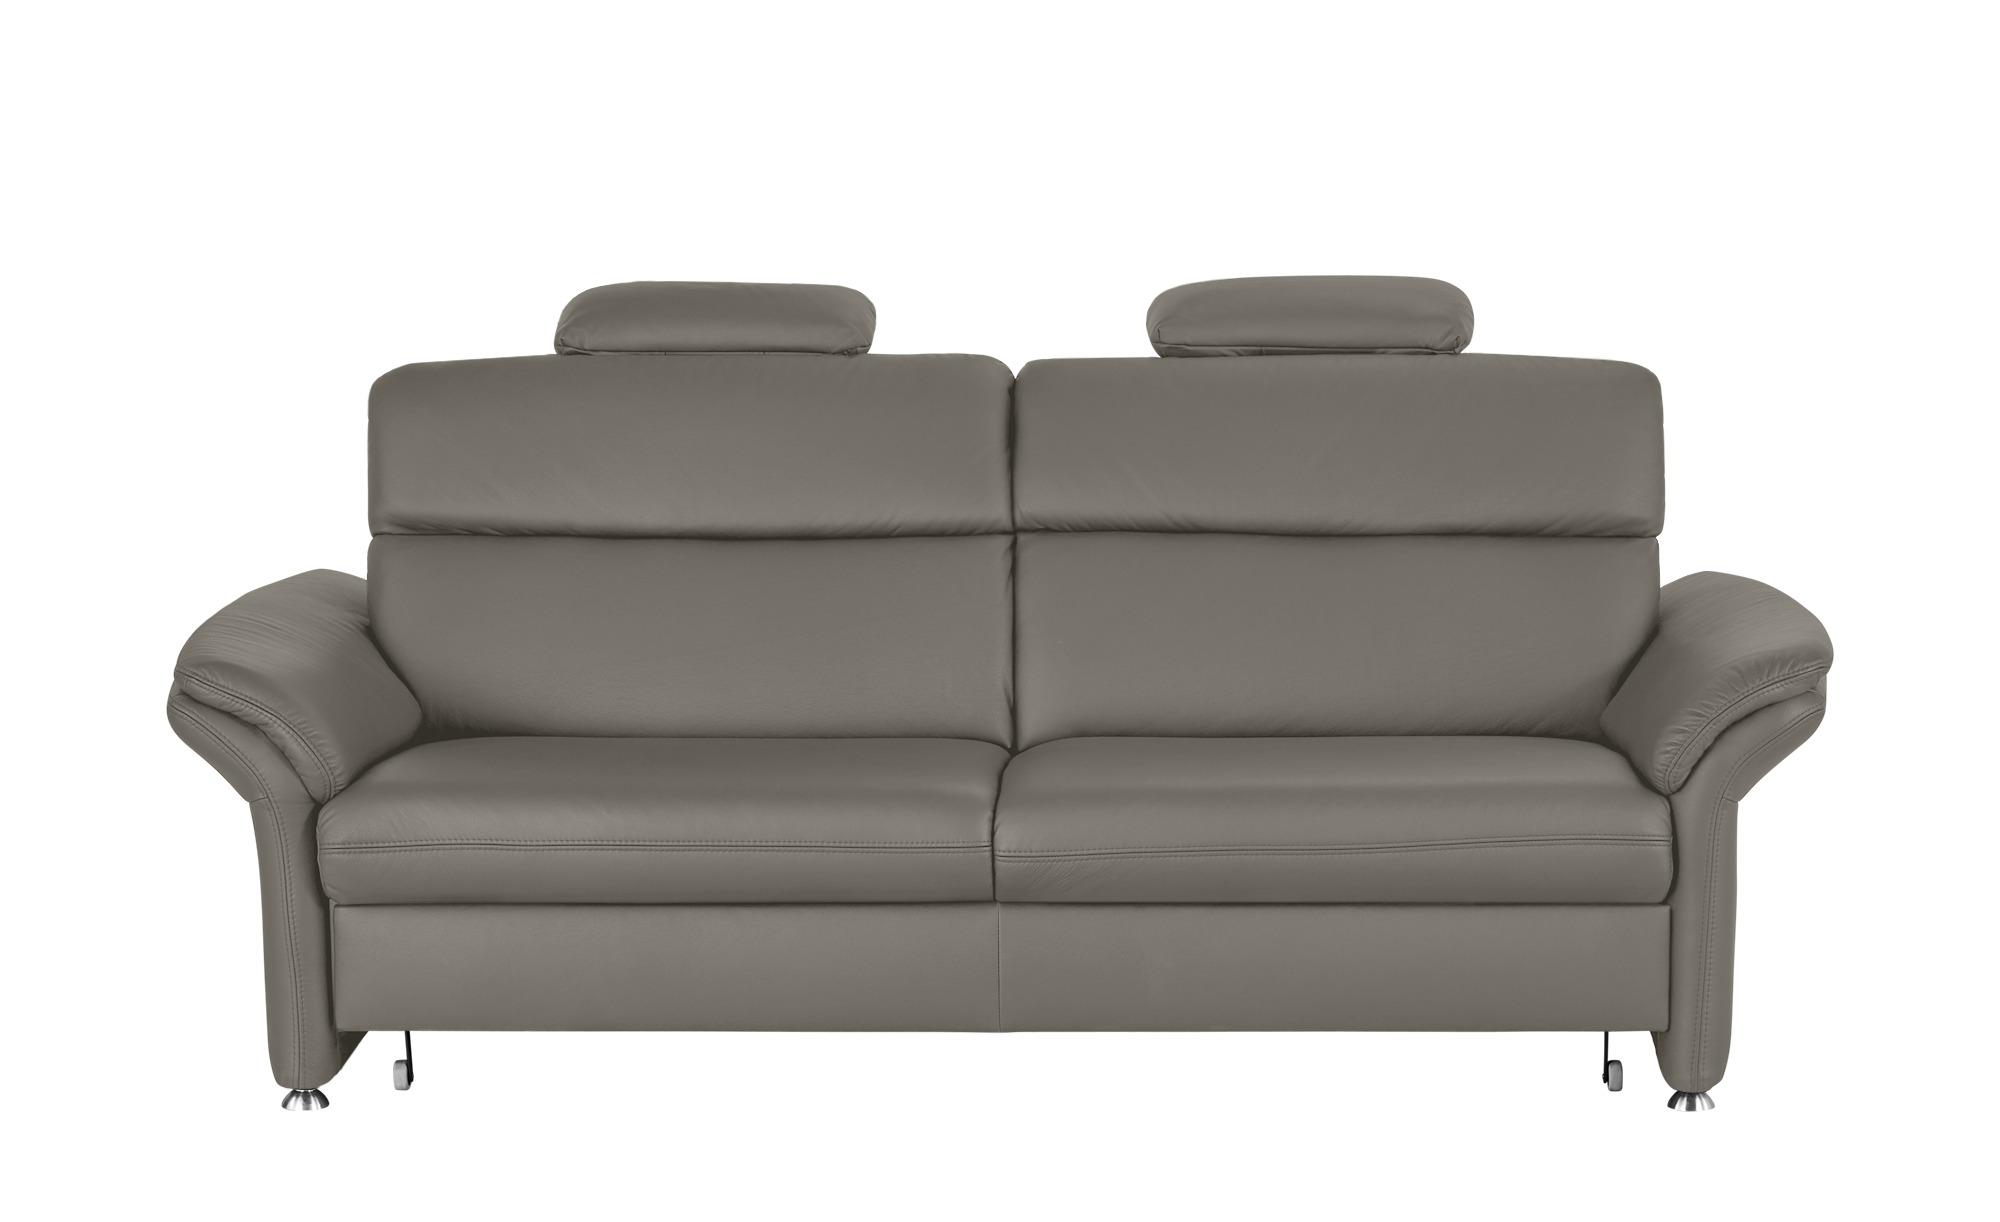 meinsofa ledersofa manon breite 228 cm h he 94 cm grau. Black Bedroom Furniture Sets. Home Design Ideas